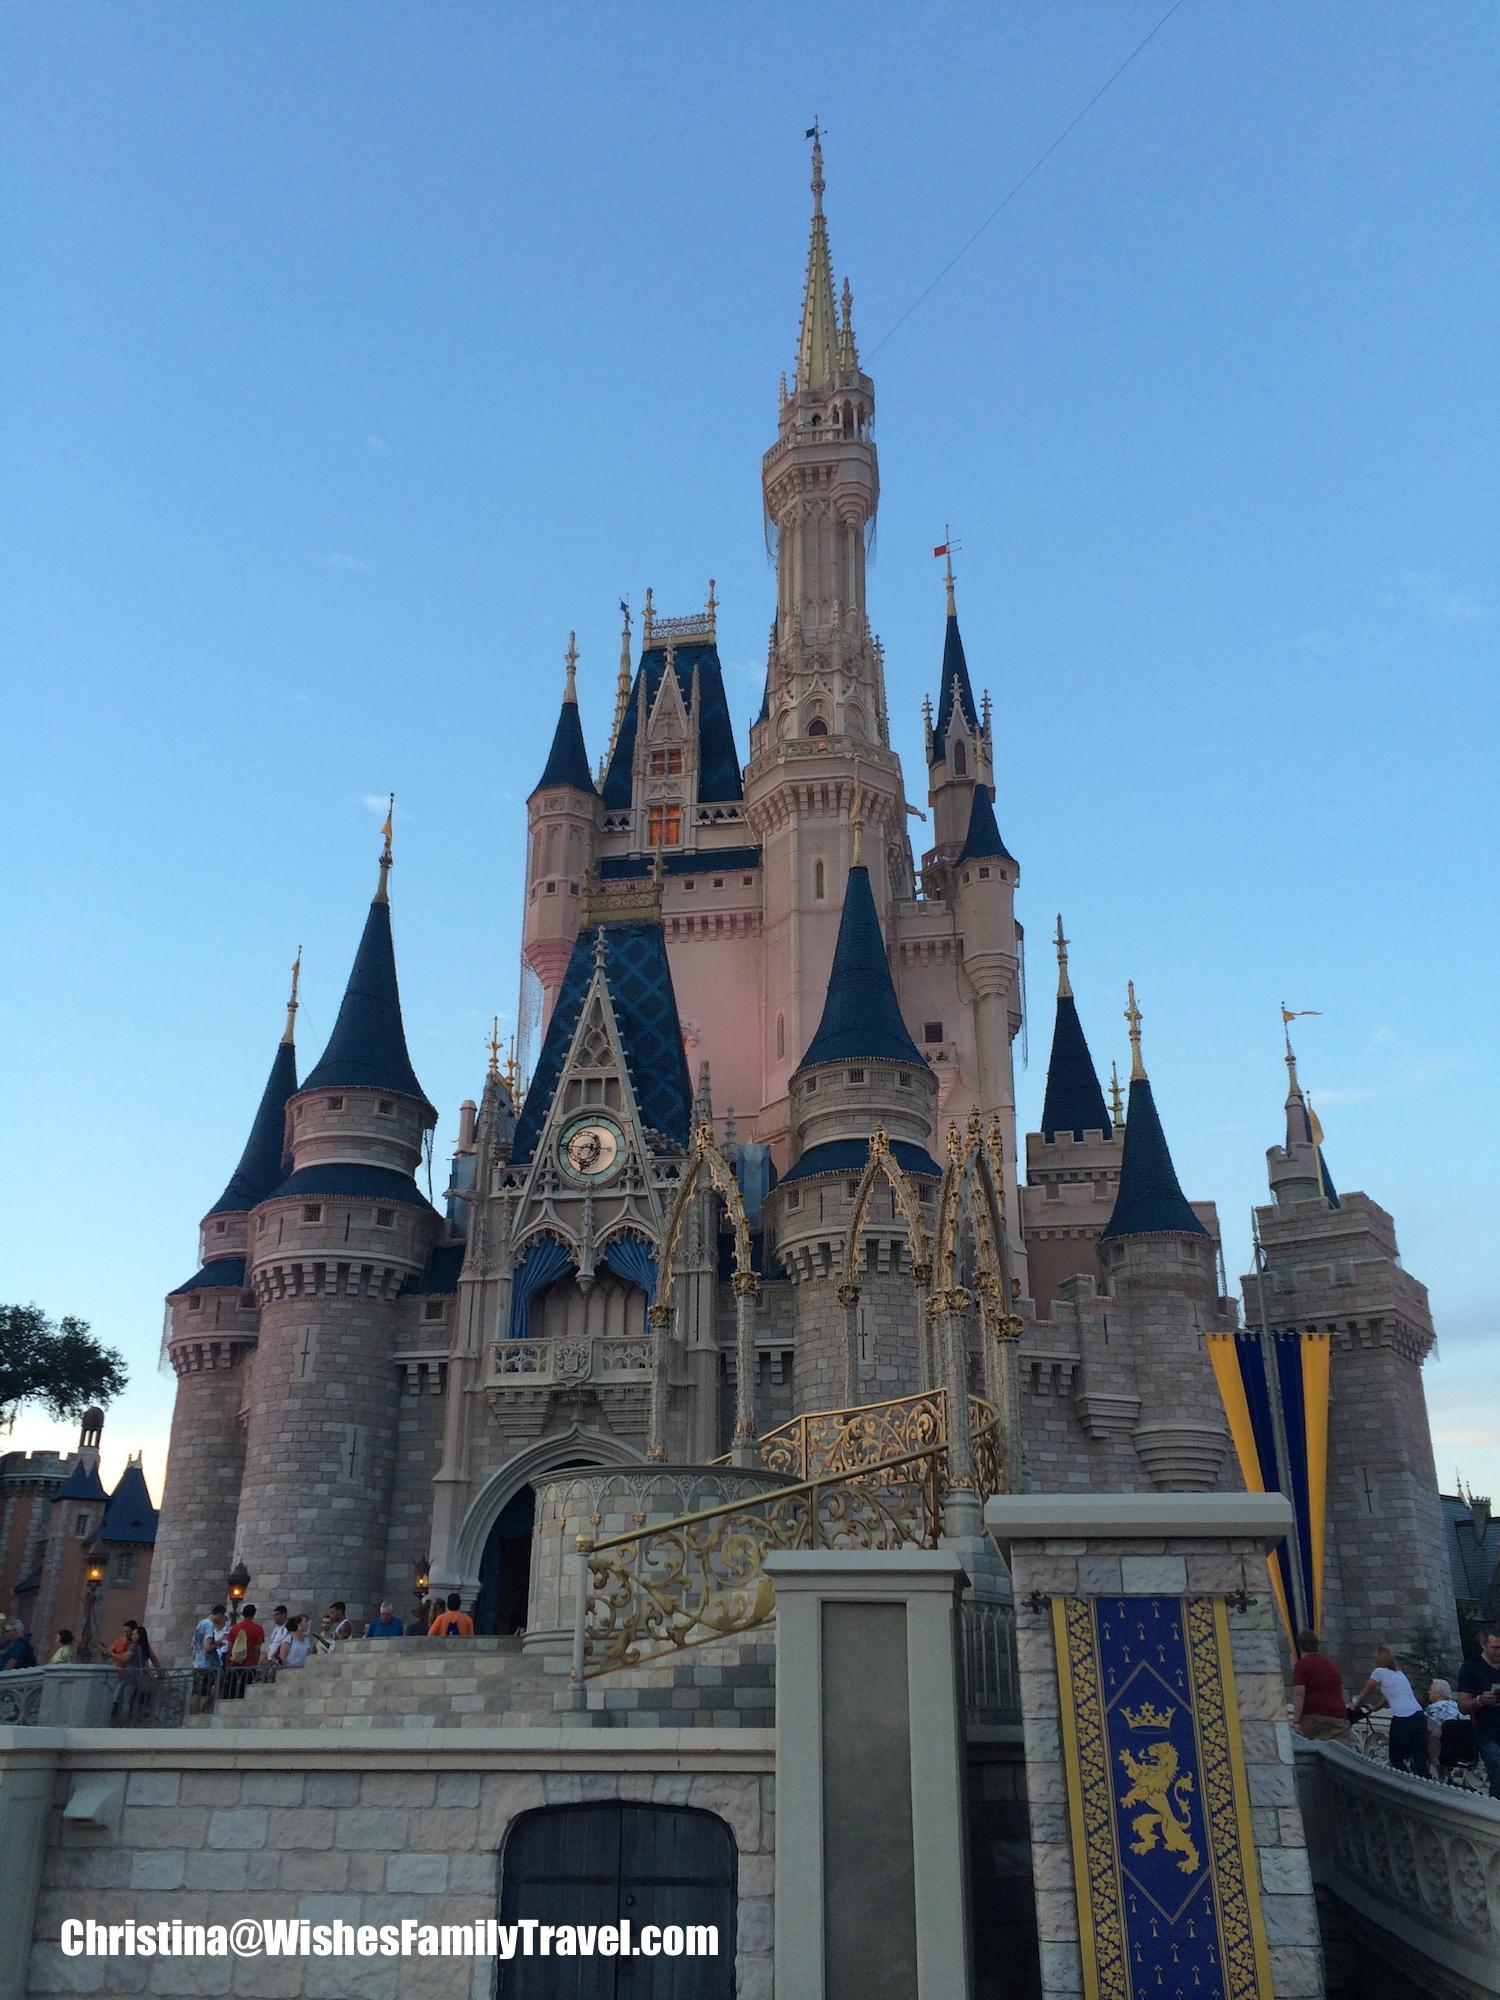 christina Wishes Family Travel